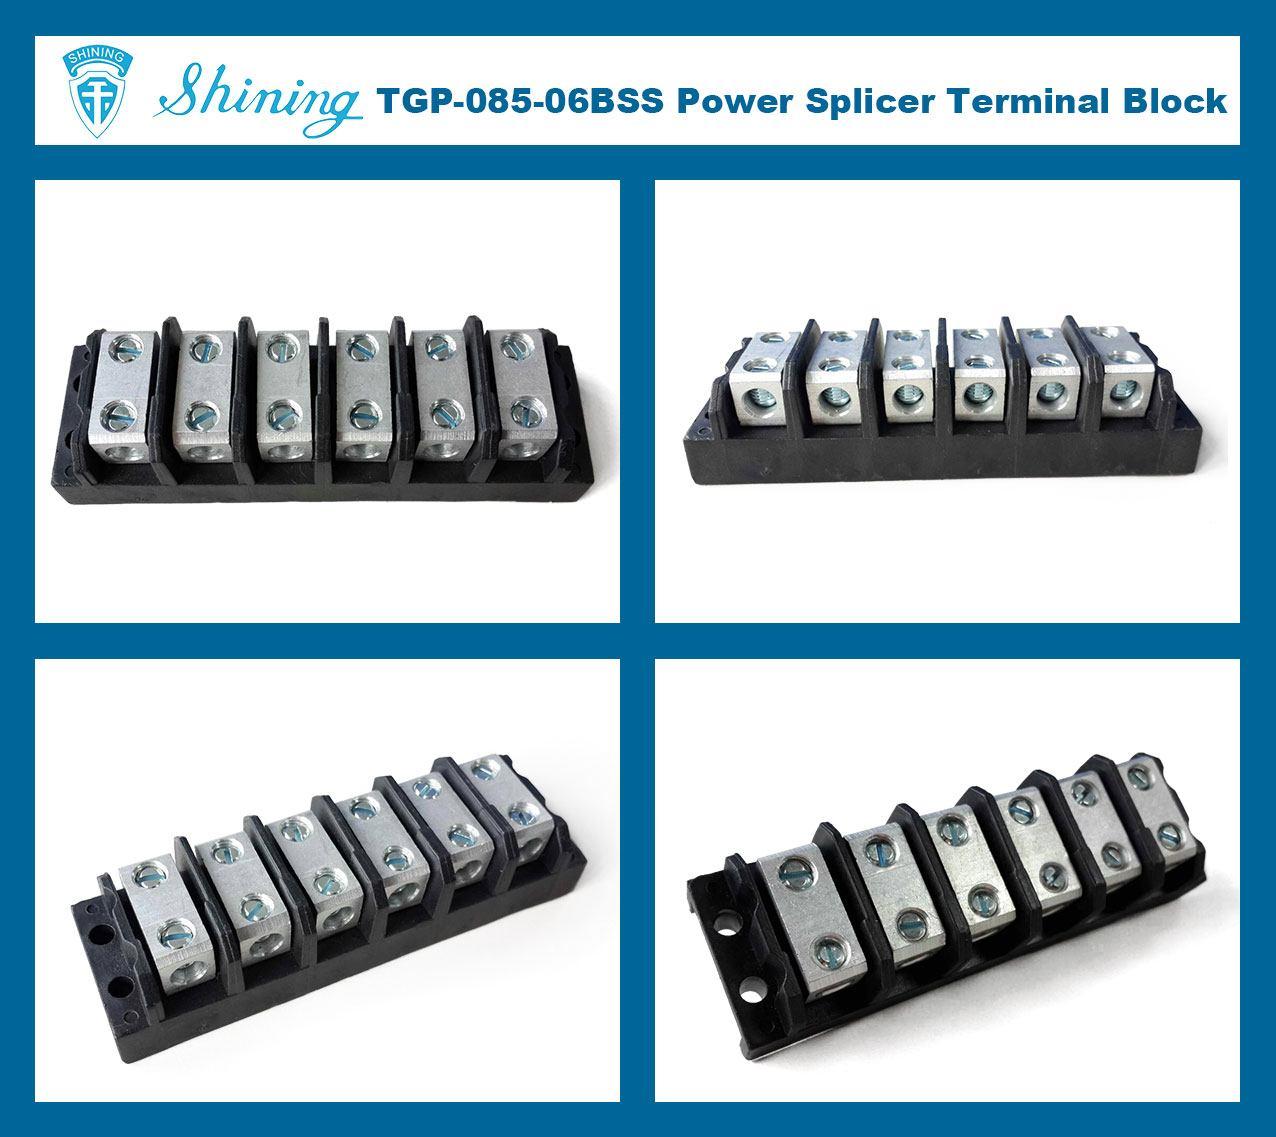 TGP-085-06BSS 600V 85A 6 Way Power Splicer Terminal Block